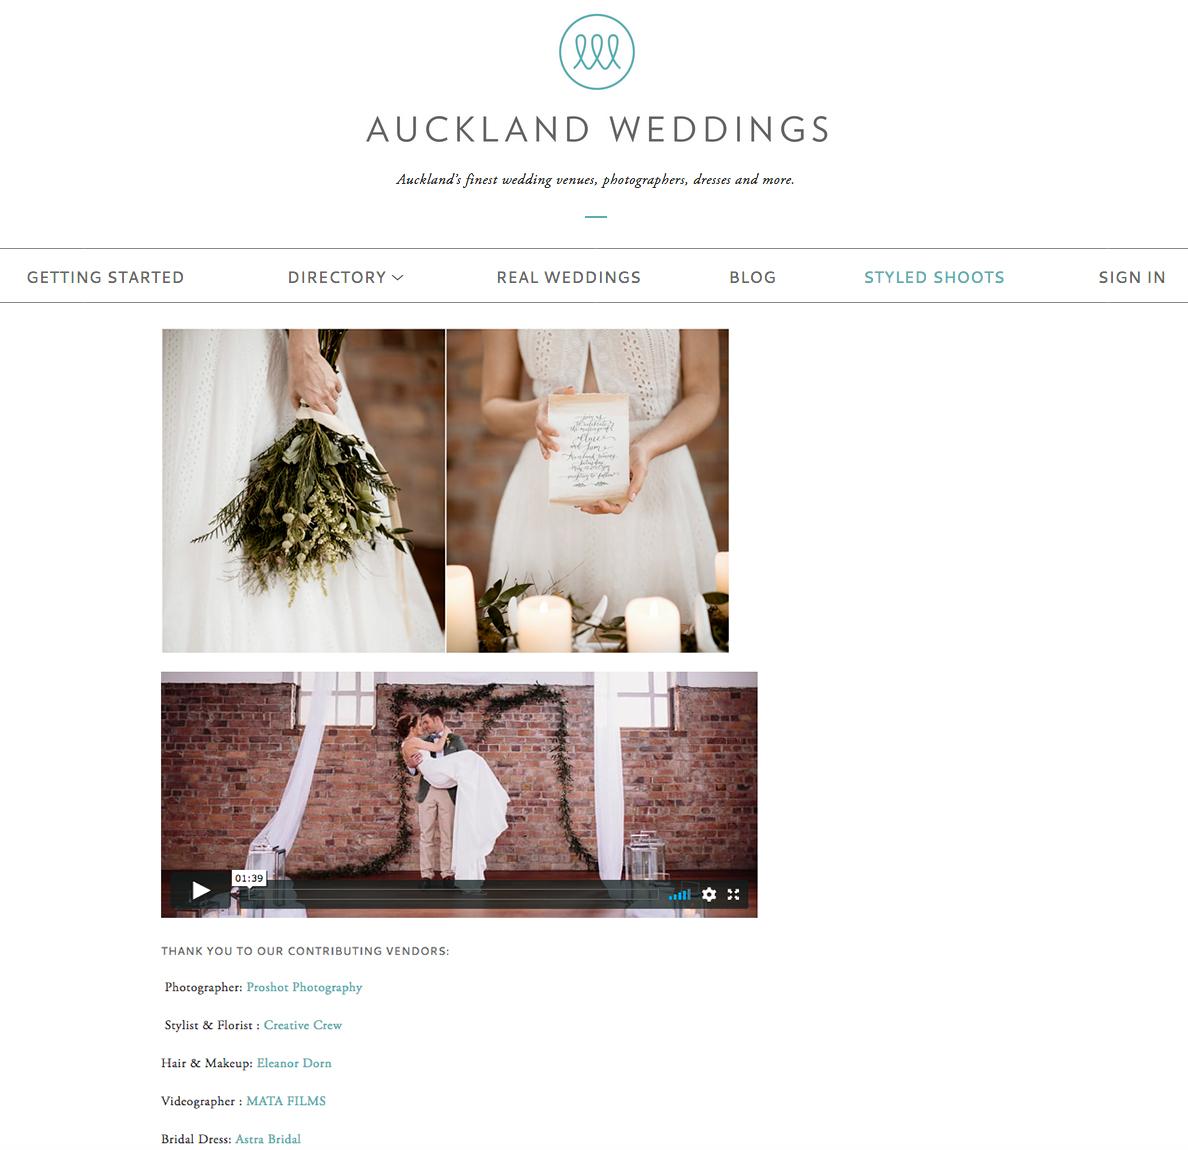 Read full article here  https://www.aucklandweddings.co.nz/urban-romance-styled-shoot